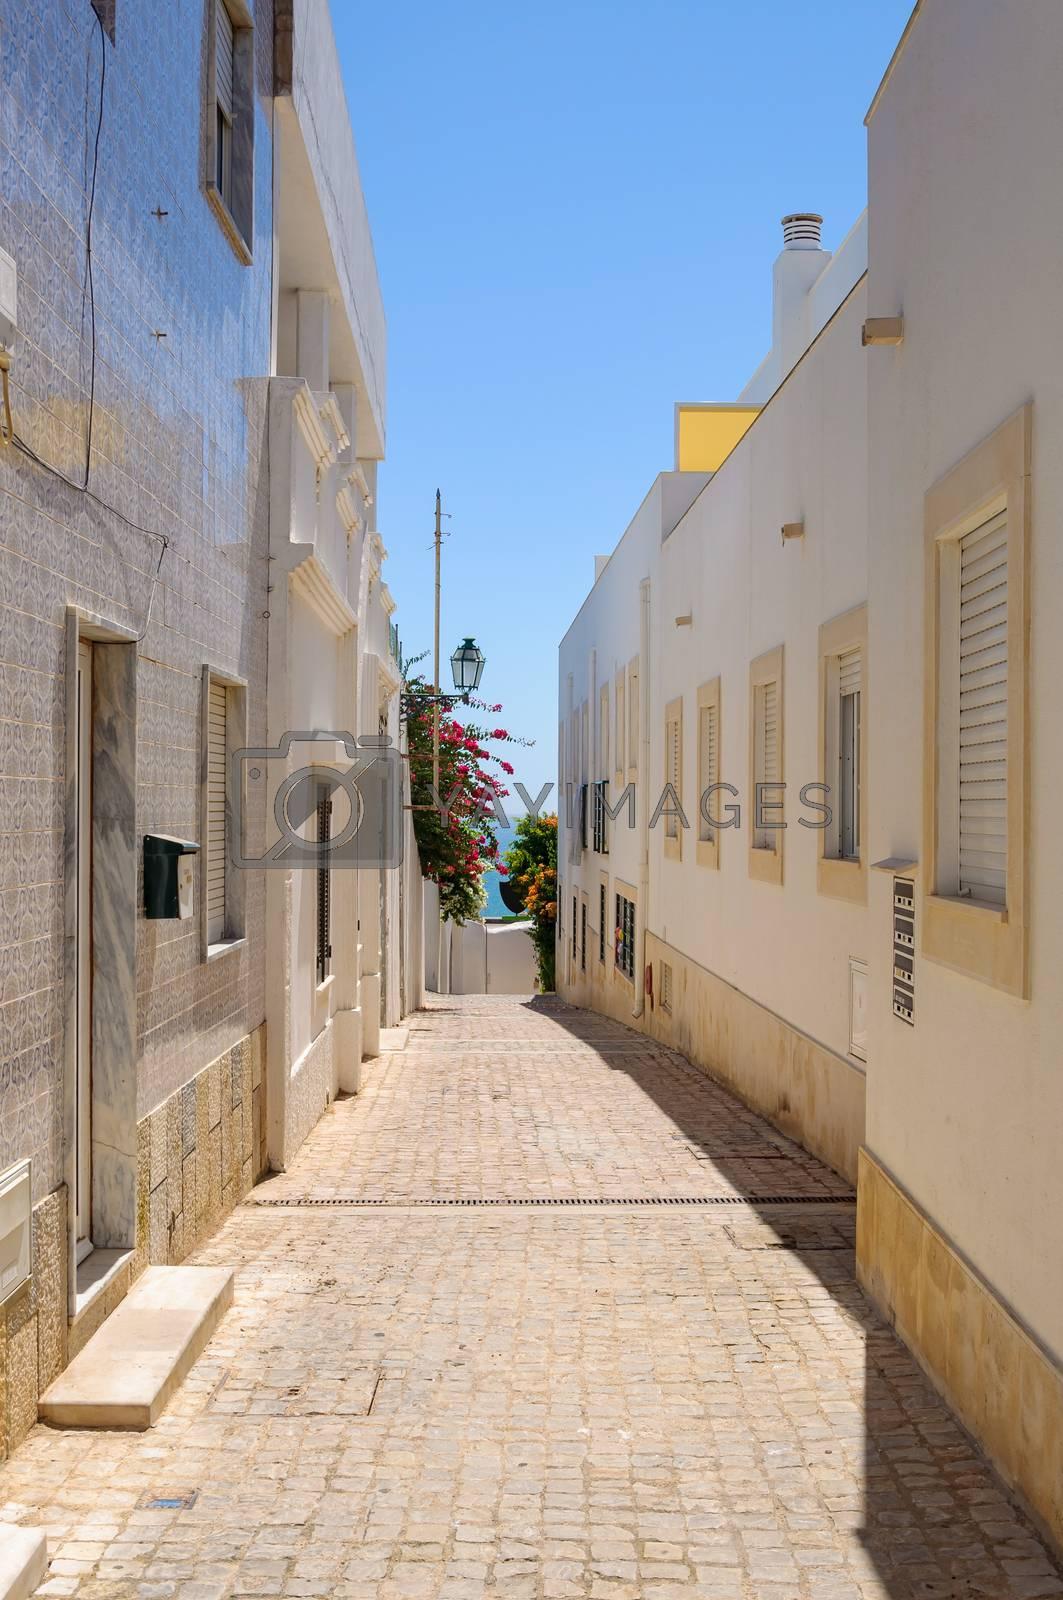 Picuresque narrow street in Albufeira, Algarve, Portugal